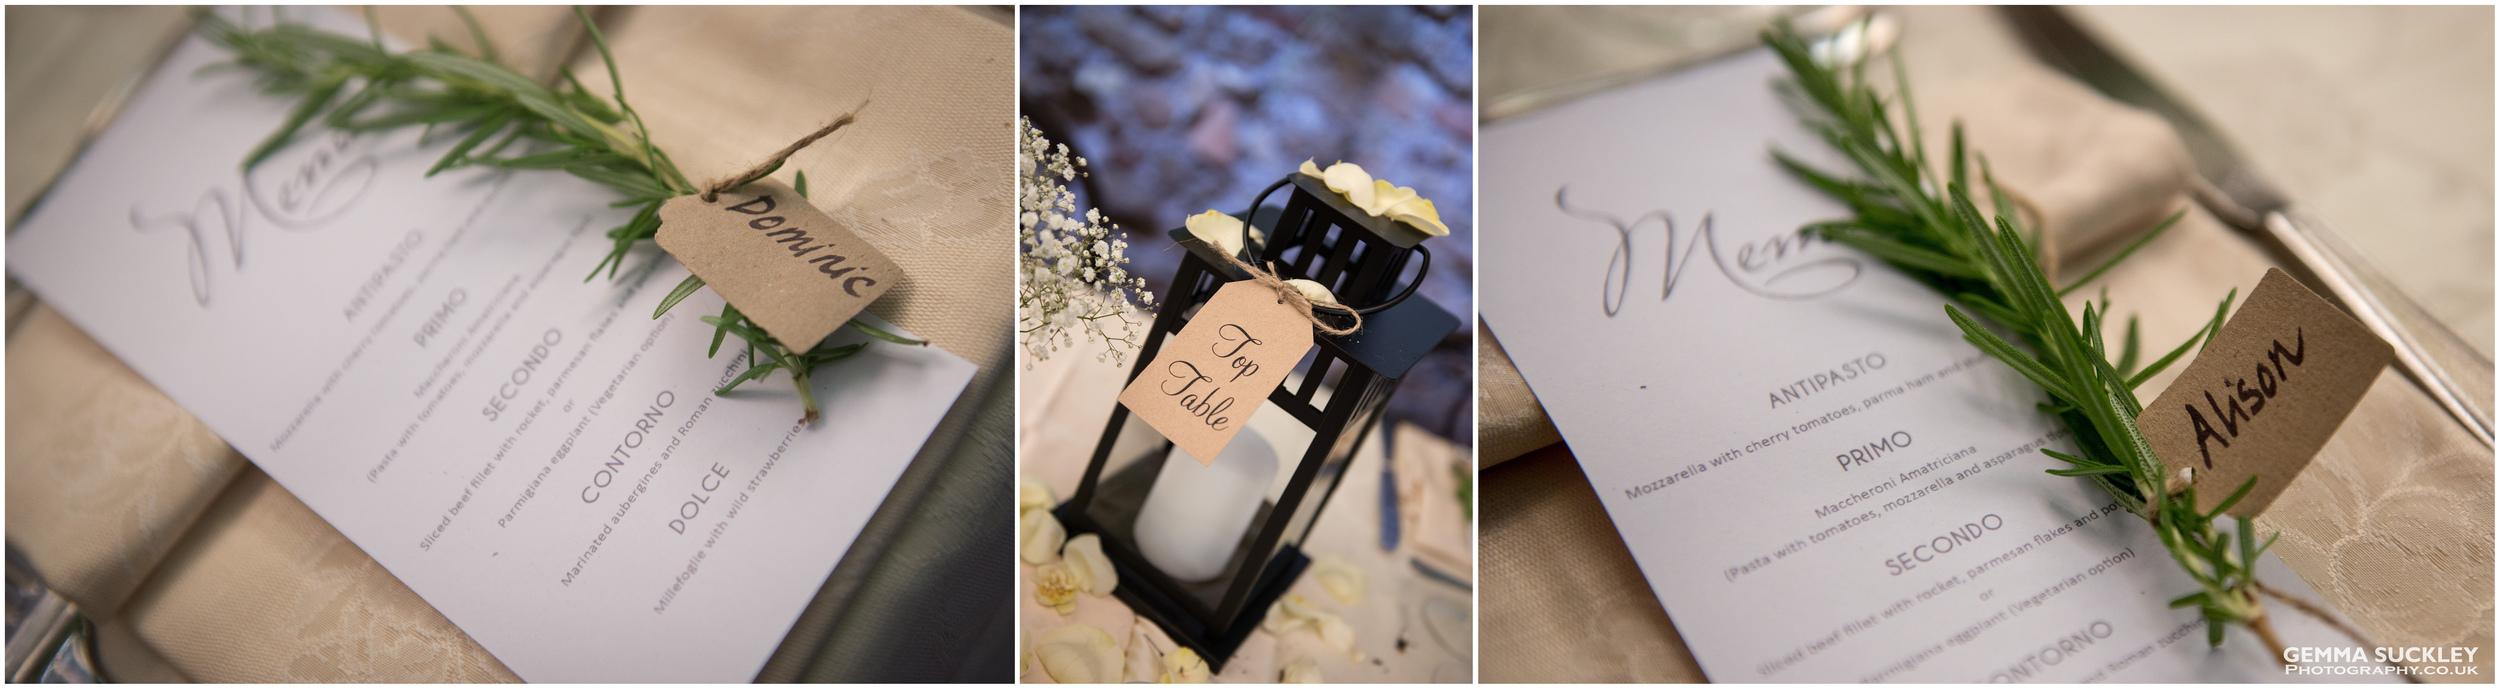 yorkshire-wedding-photographer.jpg